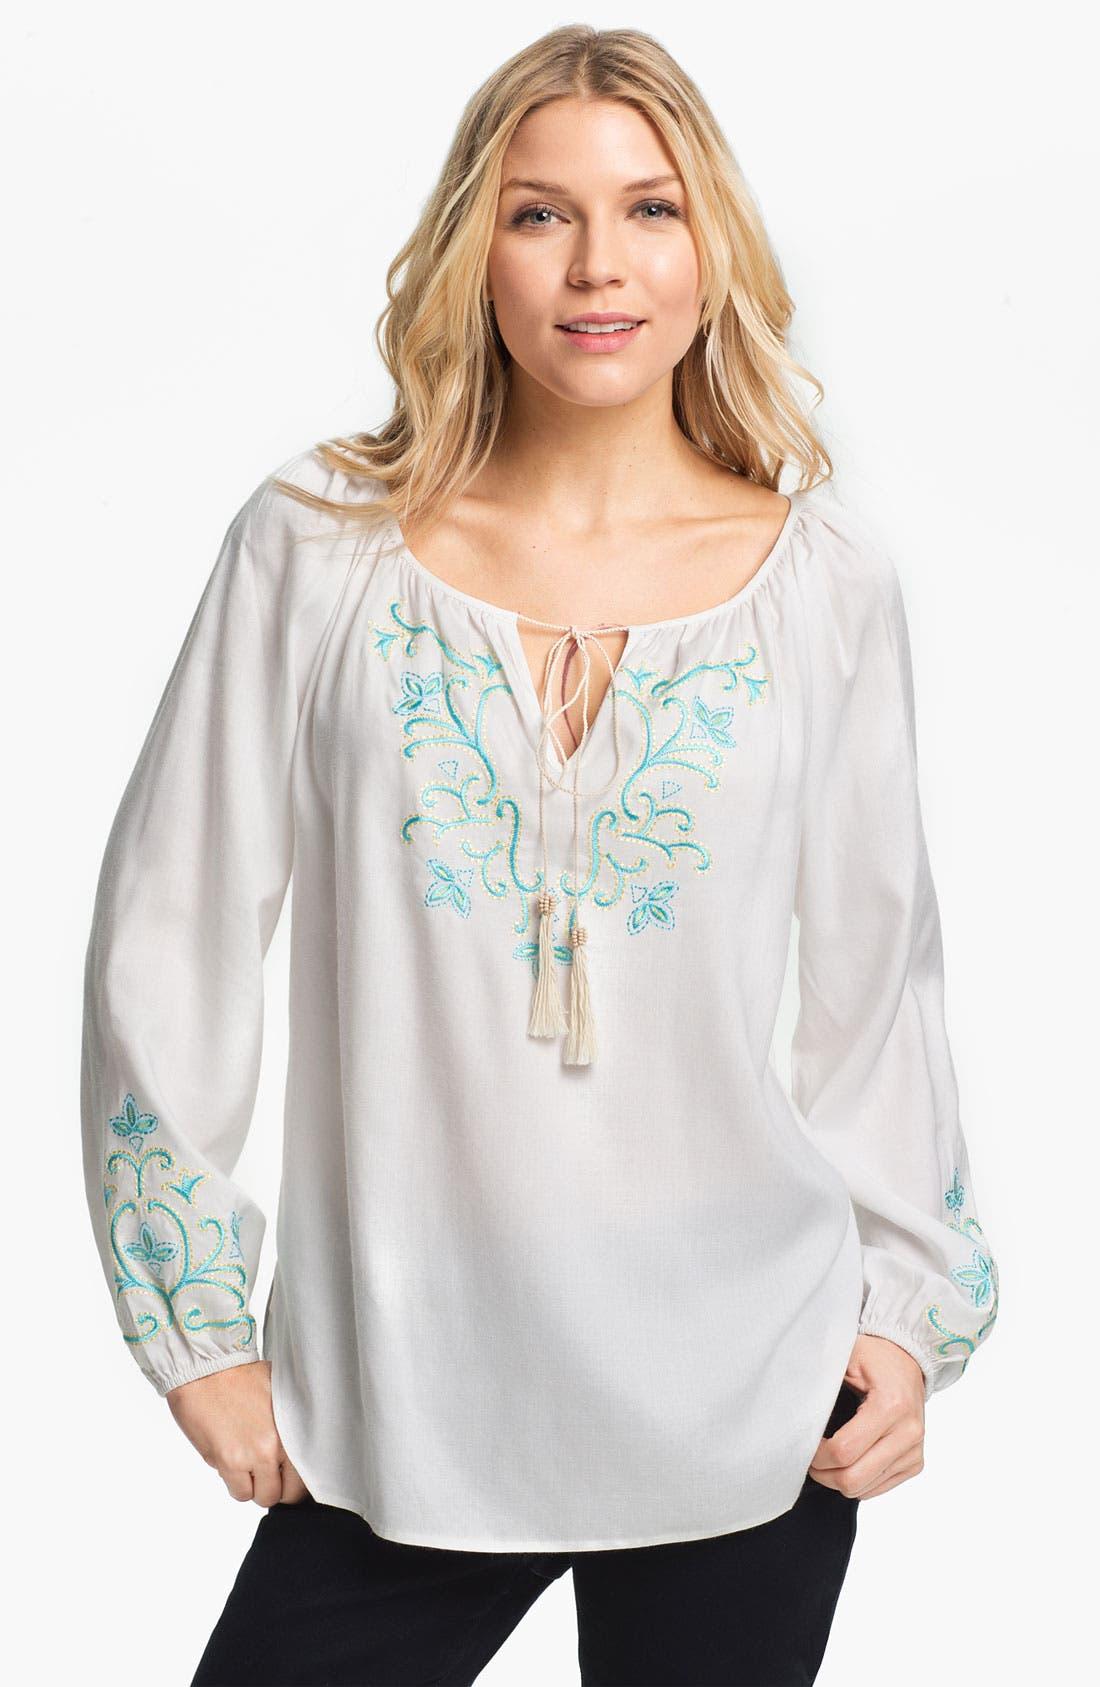 Main Image - Karen Kane Tassel Tie Embroidered Blouse